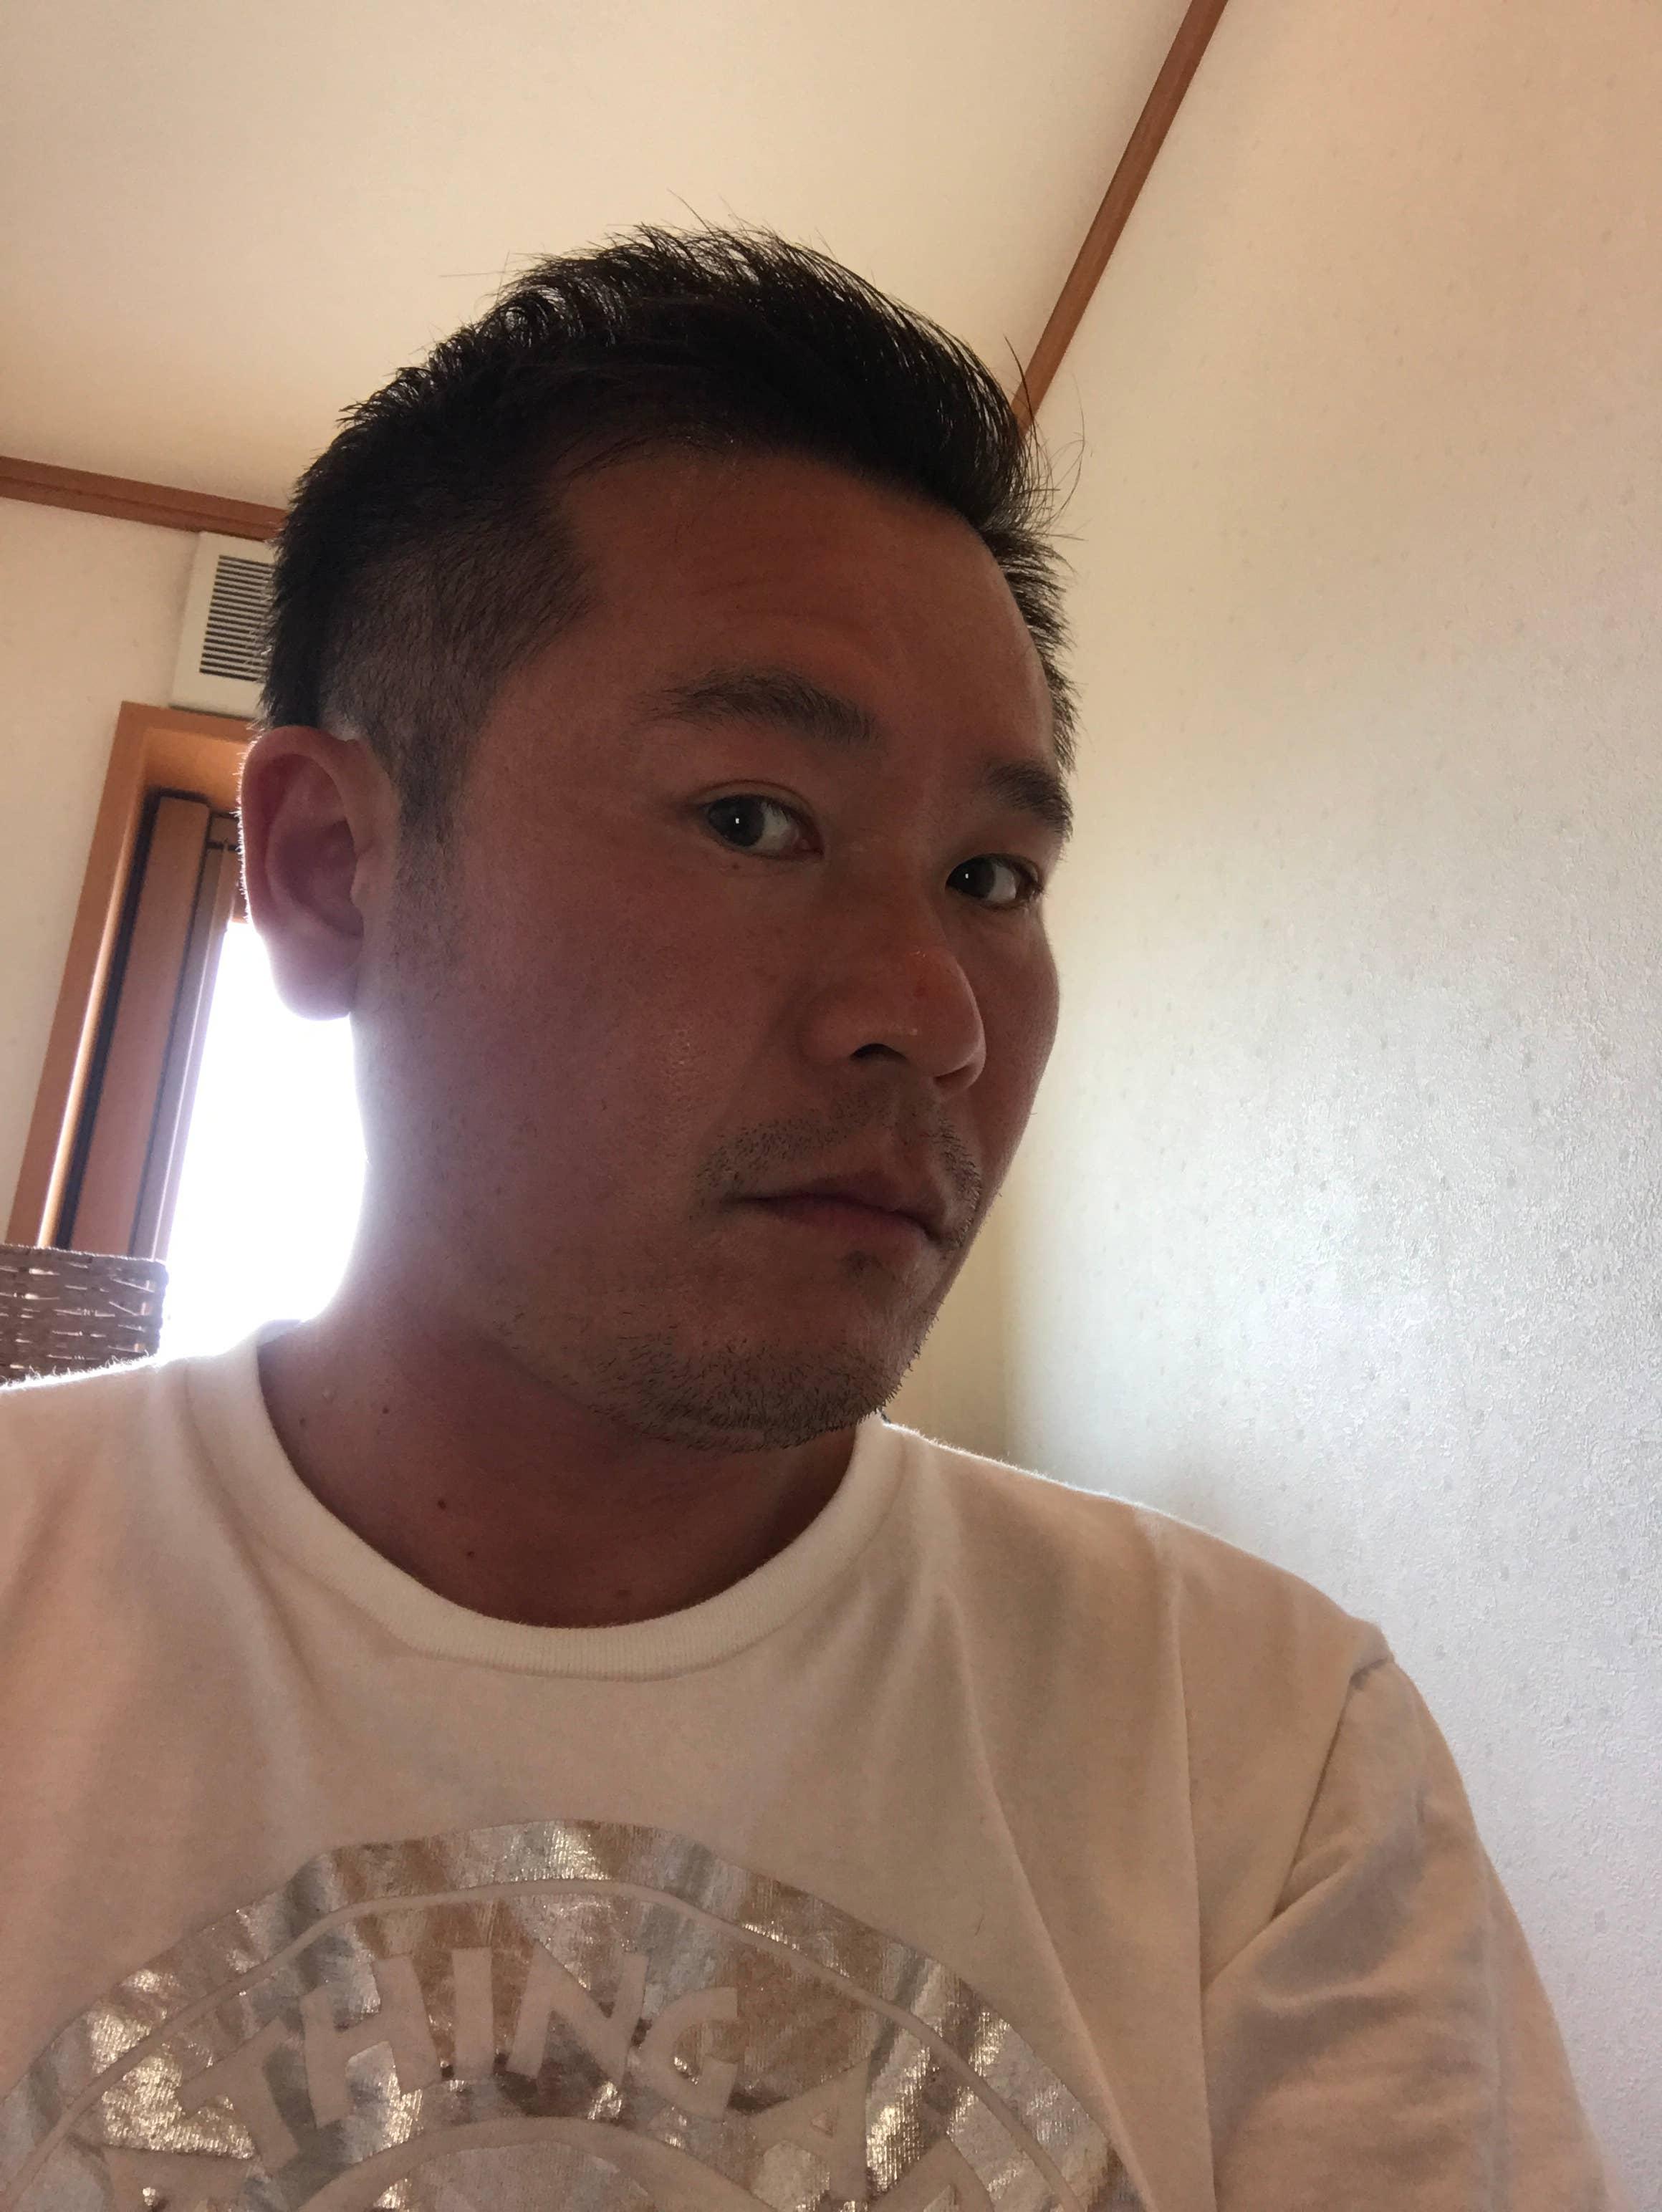 kunihiko takeishi